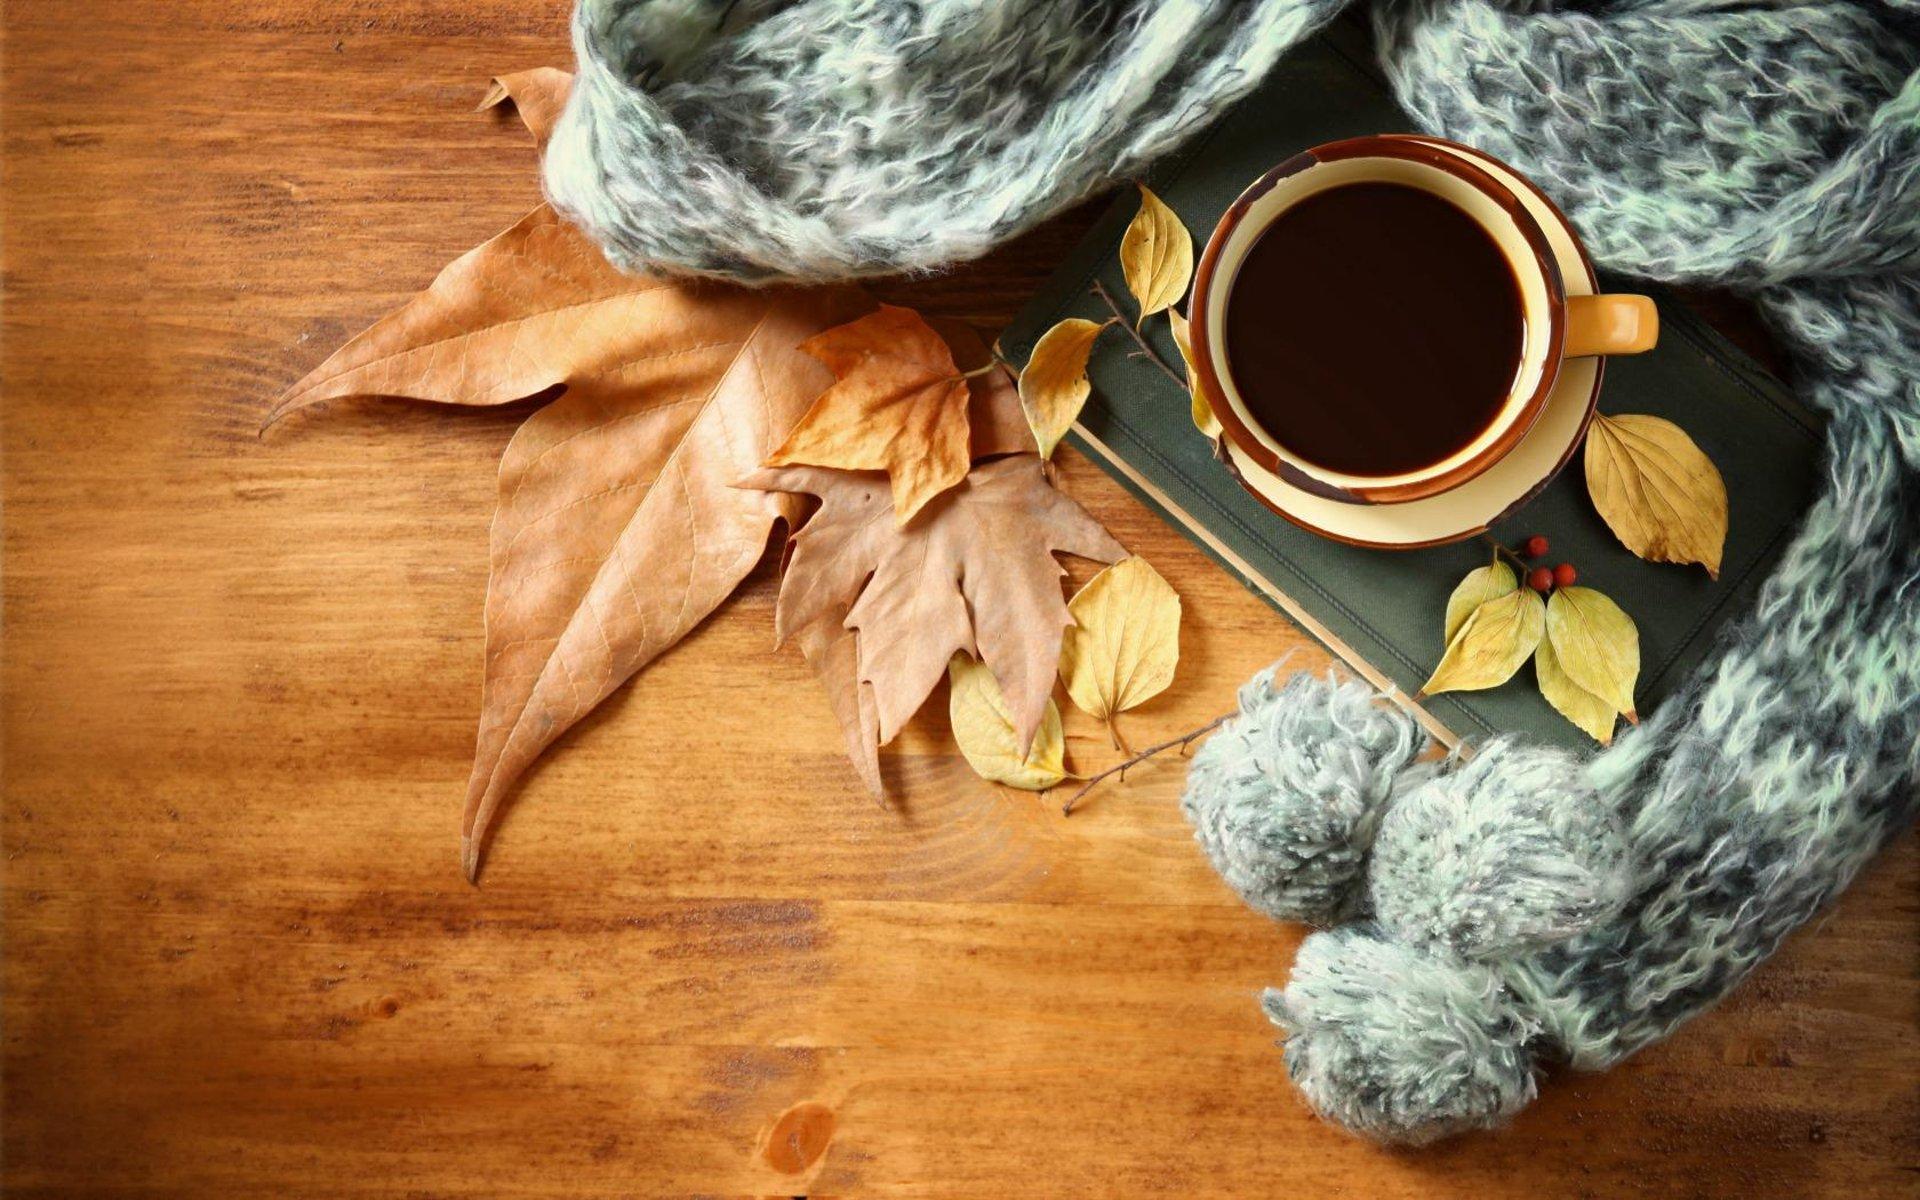 Осенний аукцион подарков